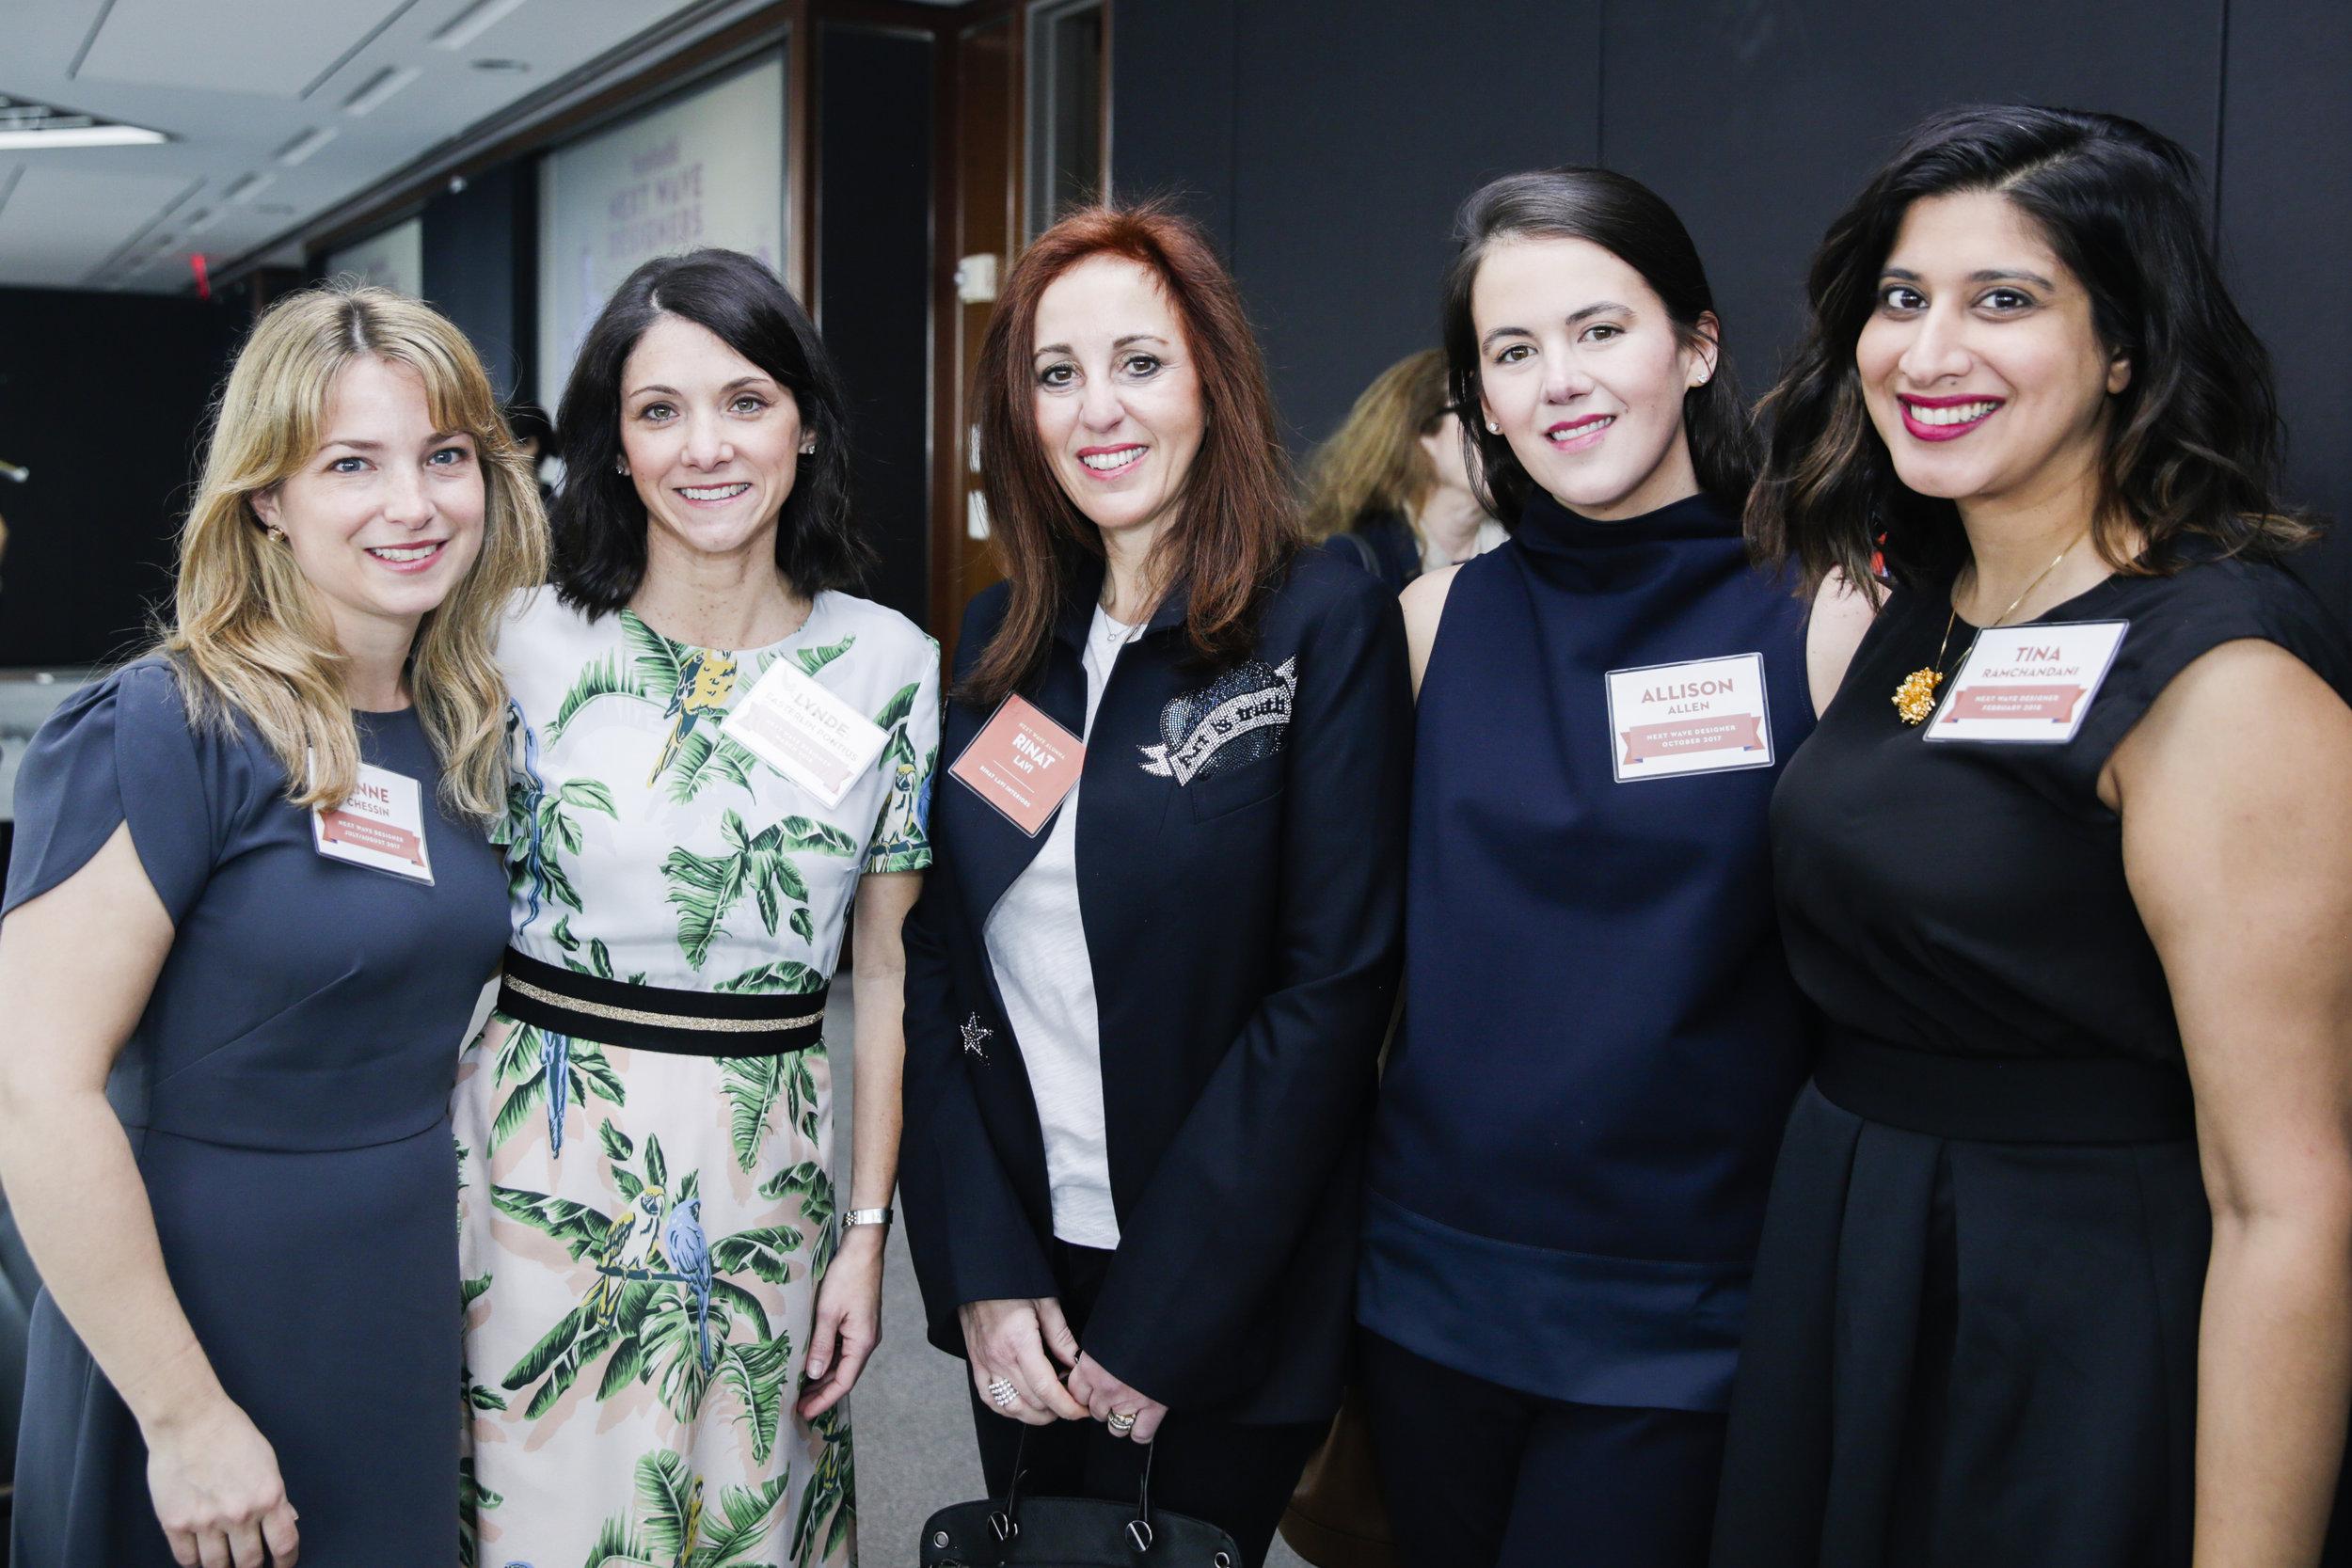 Anne Chessin, Lynde Easterlin Pontius, Rinat Lavi, Allison Allen, Tina Ramchandani